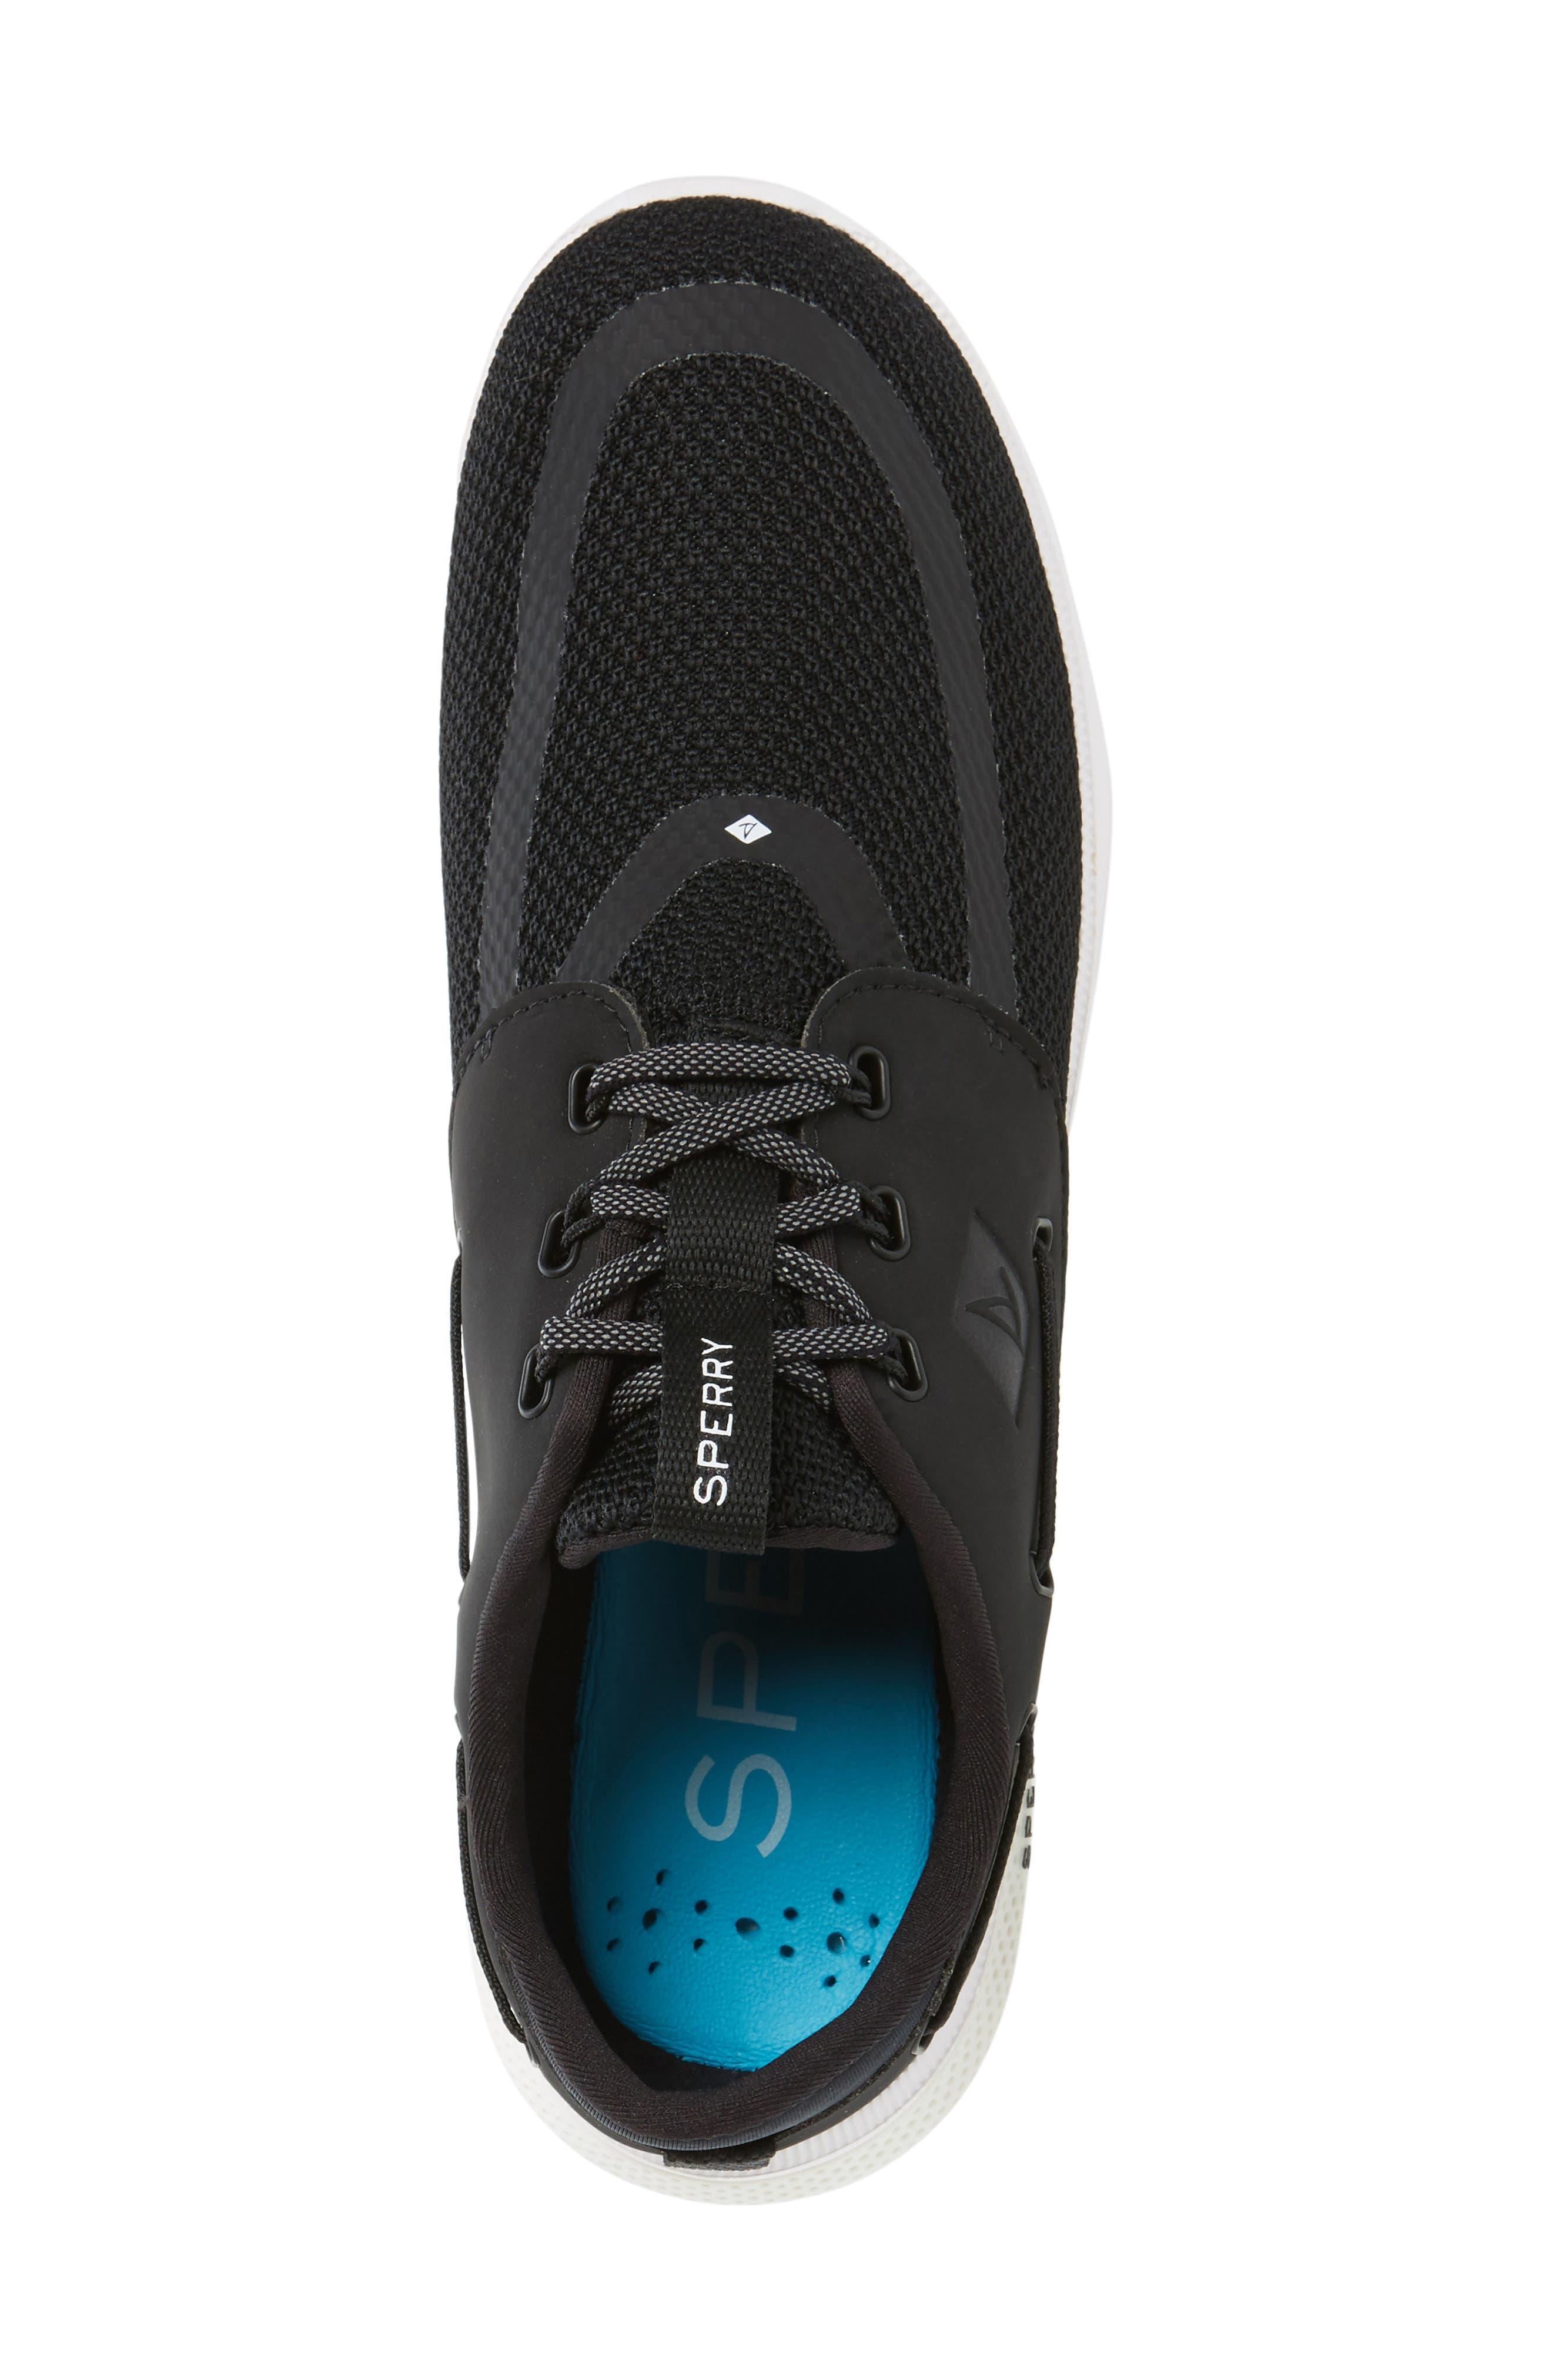 7 Seas Sneaker,                             Alternate thumbnail 3, color,                             001